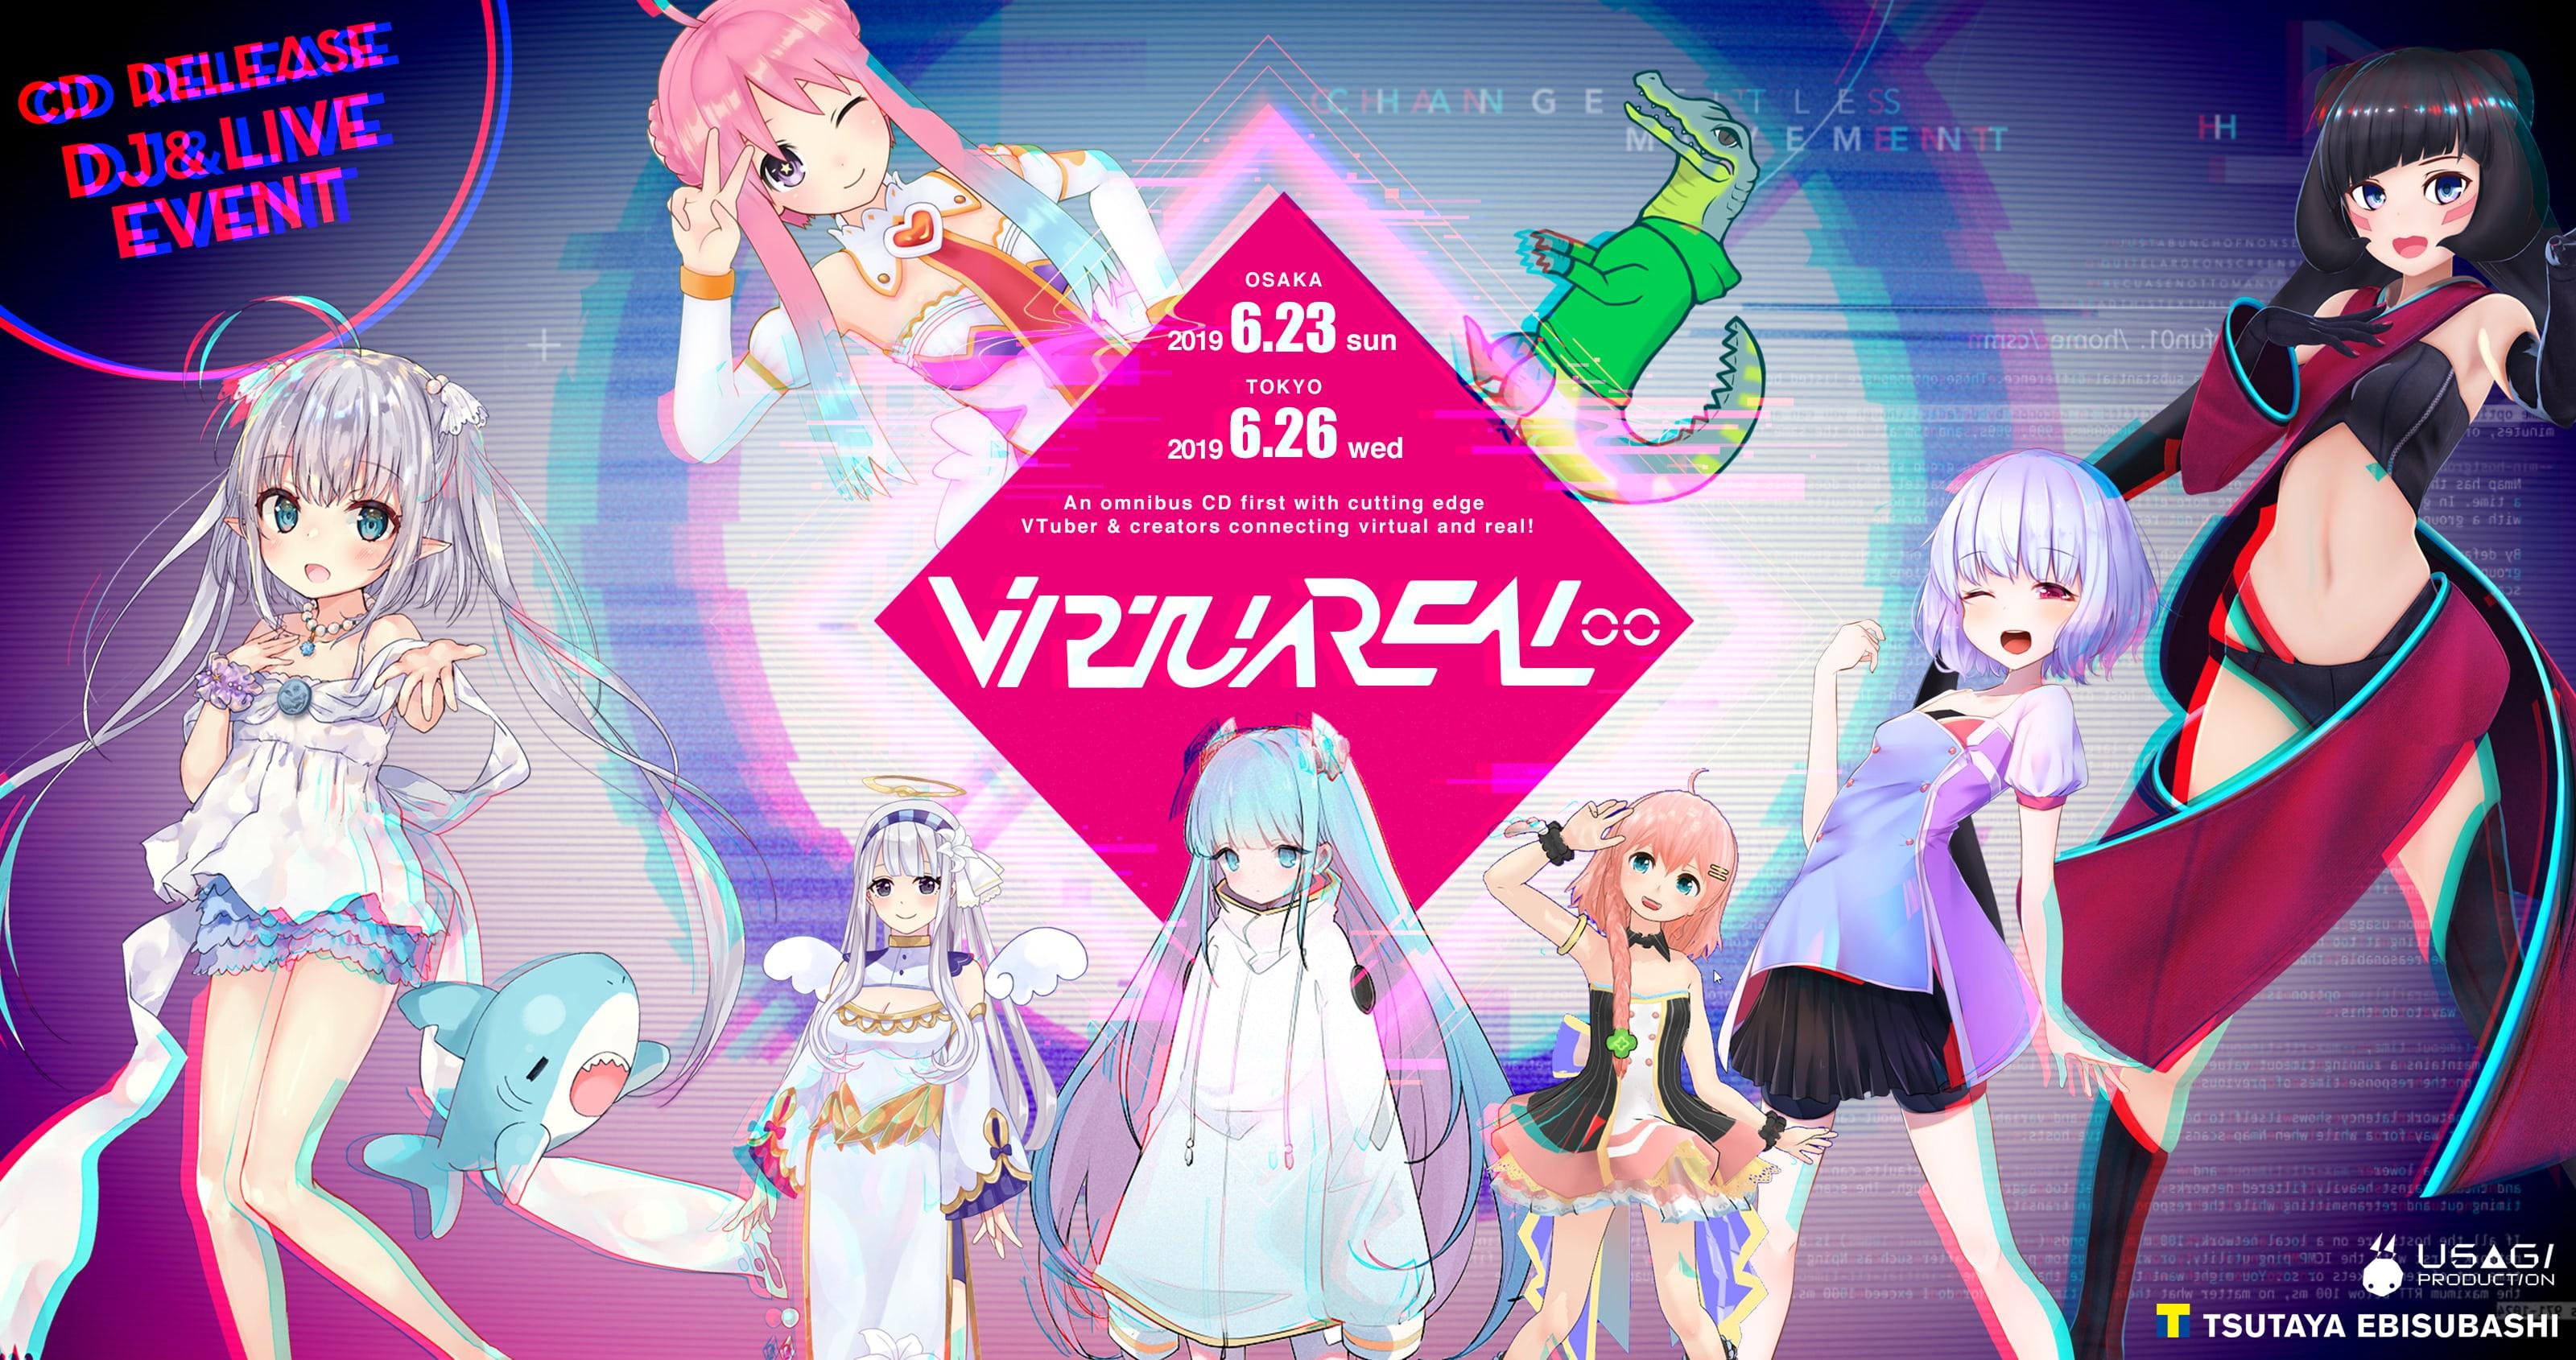 VirtuaREAL.00 produced by USAGI Production